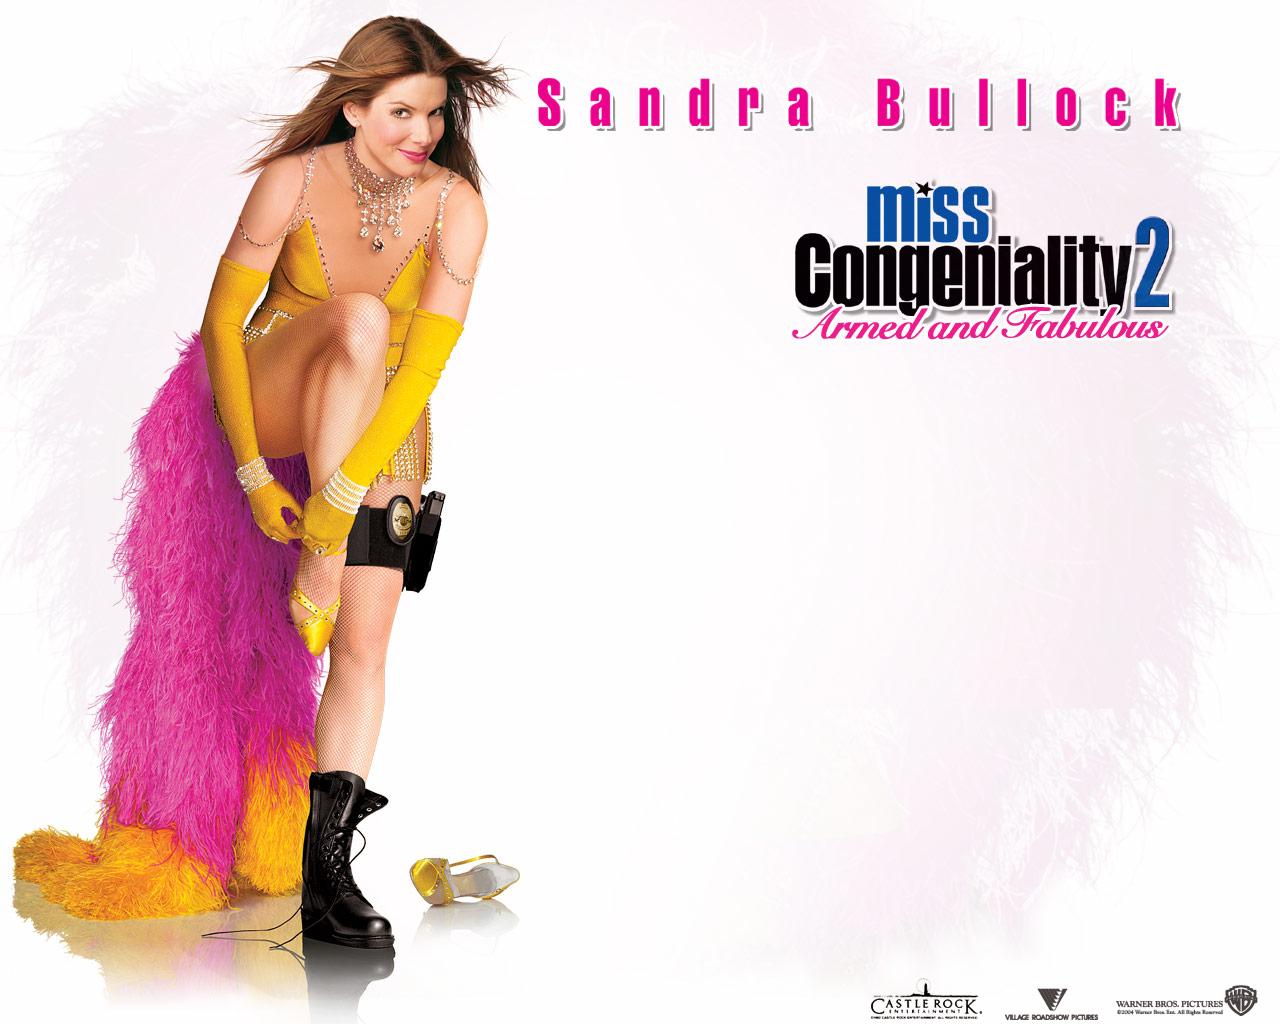 http://4.bp.blogspot.com/-b3kAjChUCjo/T0alyGPTLkI/AAAAAAAABx0/gag1IlcqHoY/s1600/Sandra_bullock_in_Miss_Congeniality_2-_Armed_and_Fabulous_Wallpaper_3_1280.jpg